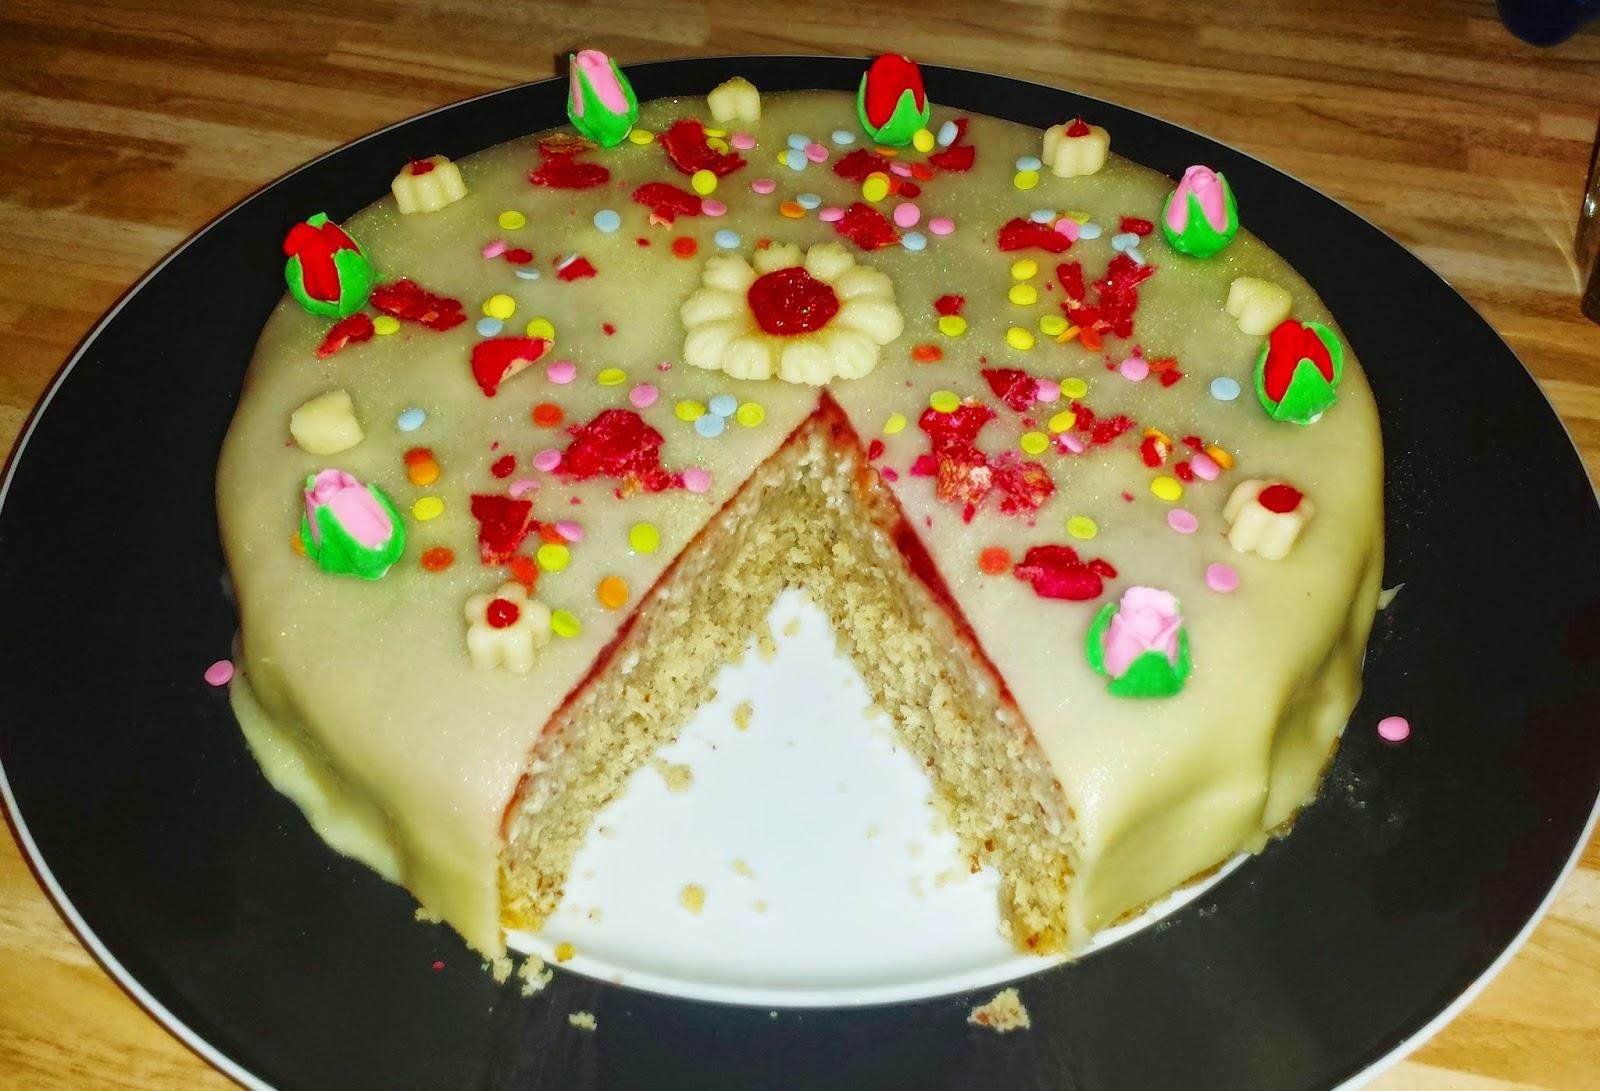 Vegane Kuchen Kaufen Munchen Rischart Backerei Konditorei Cafe I